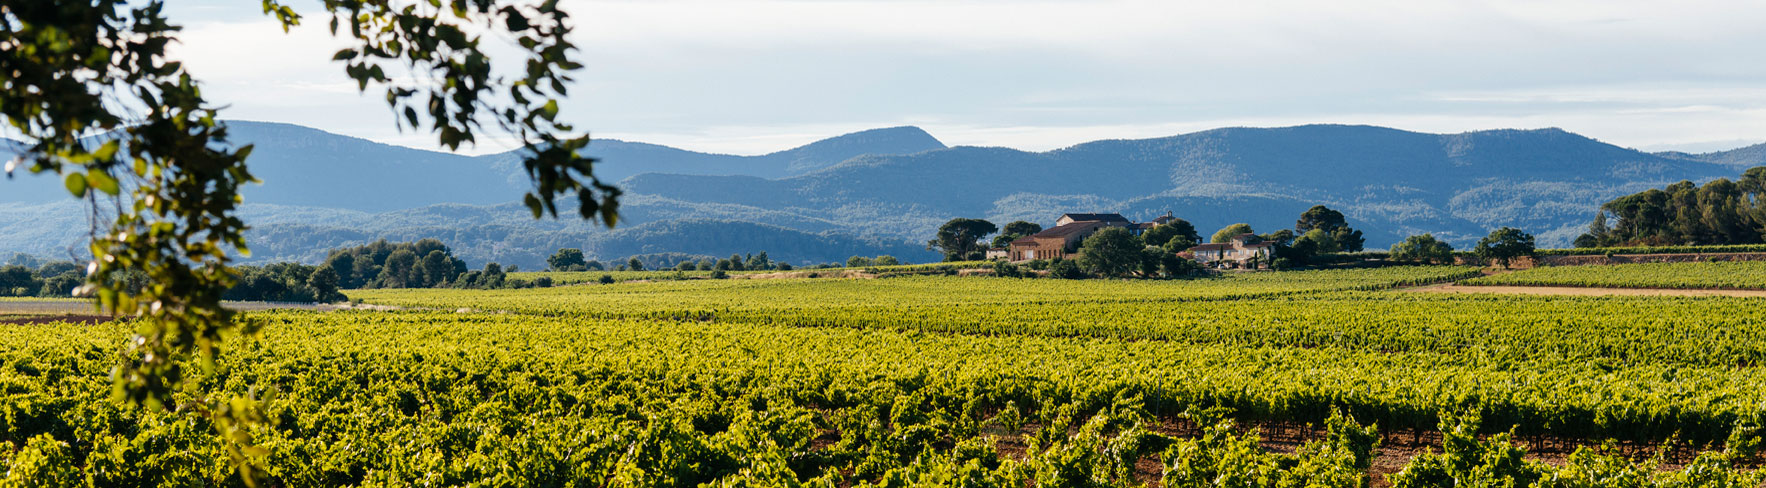 A wineyard